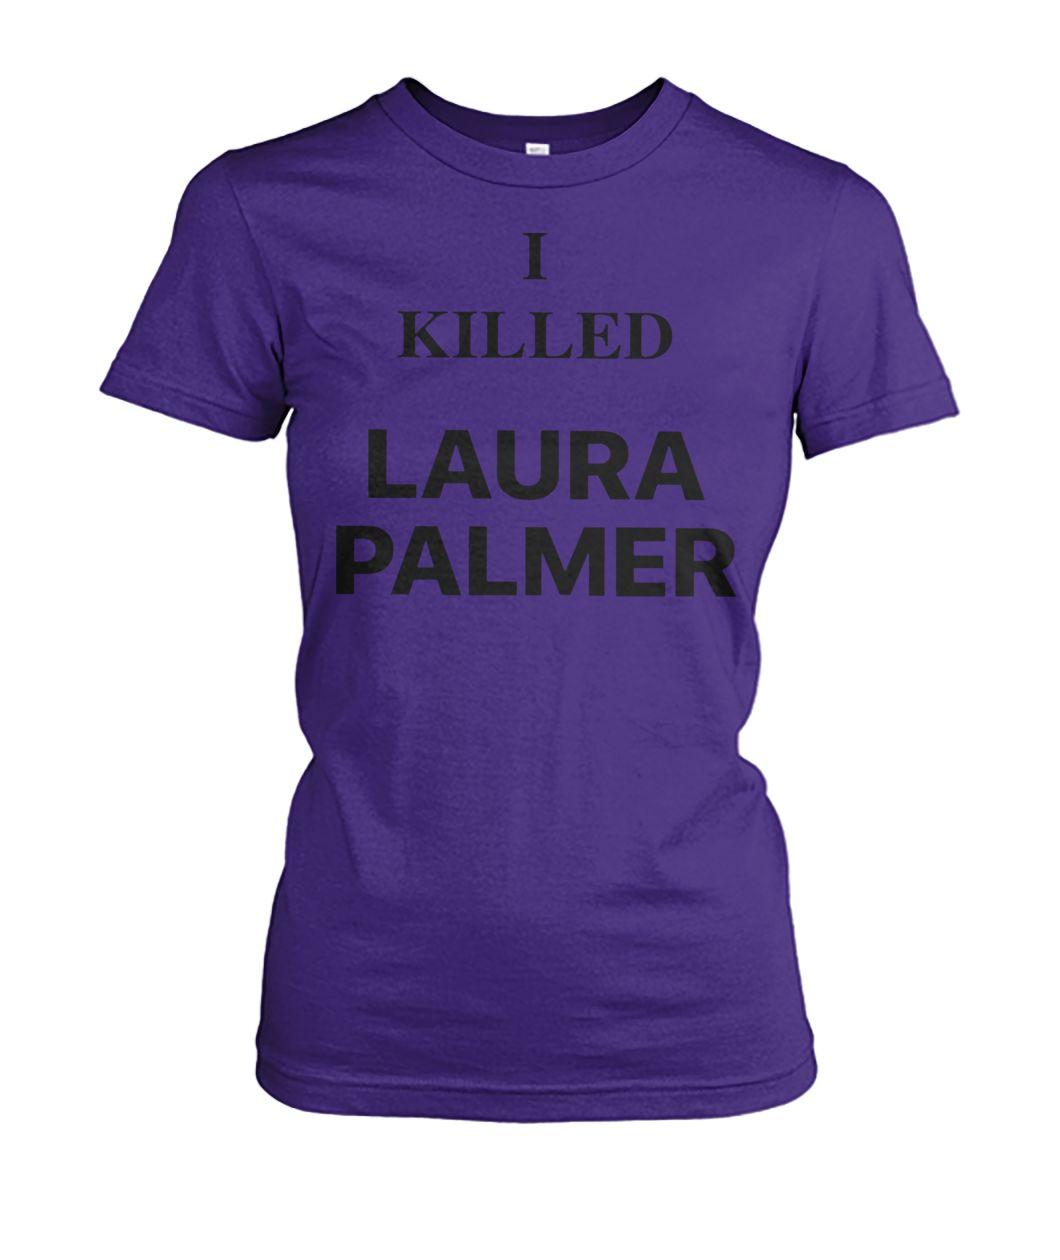 [Hot version] Twin peaks I killed laura palmer shirt